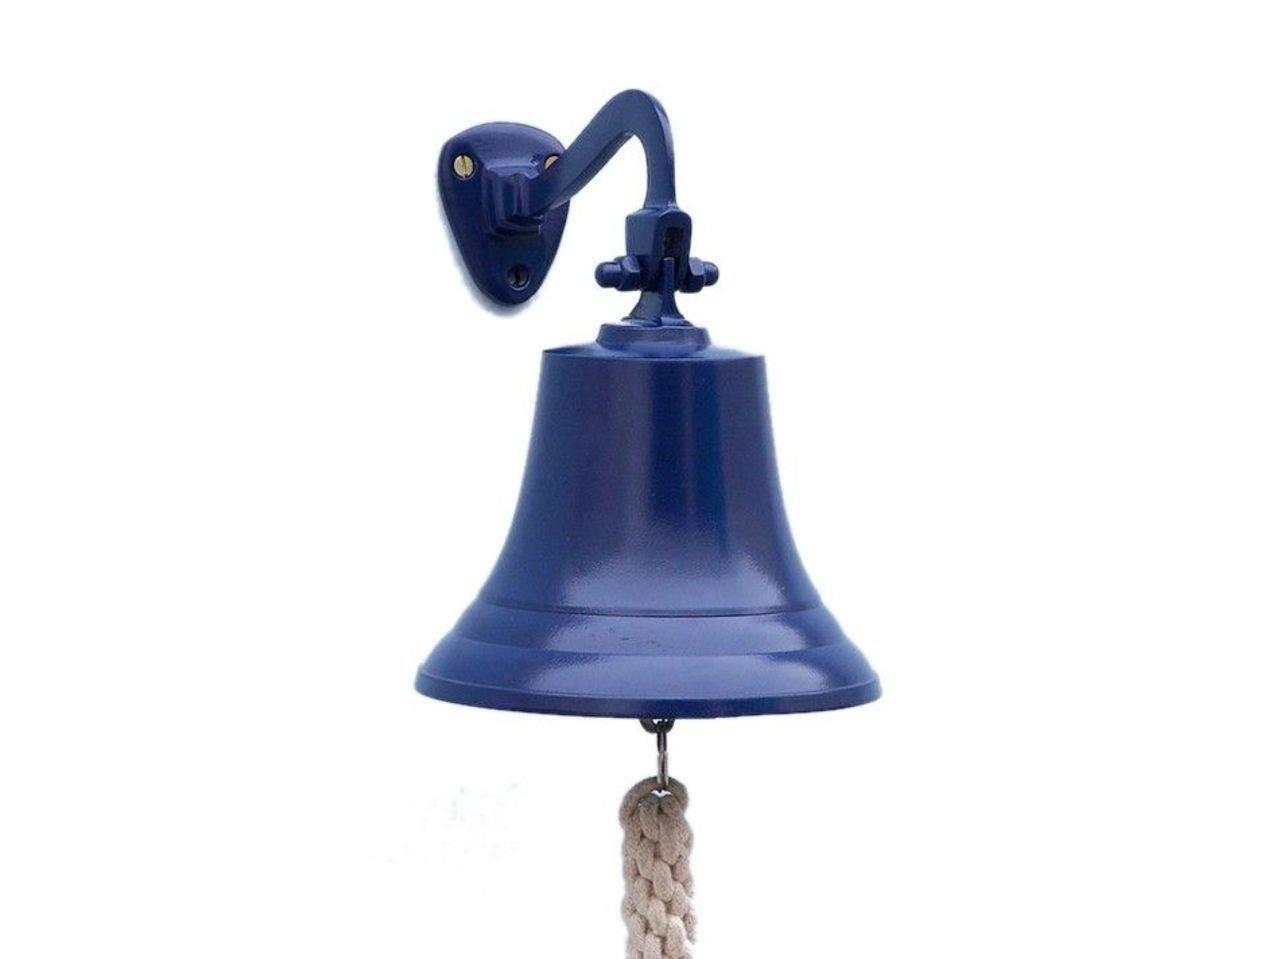 Hampton Nautical BL-2019-7-Blue Solid Brass Hanging Ship's Bell 9'' - Blue Powder Coated - Nautical Decor - Nautical Home Decoration